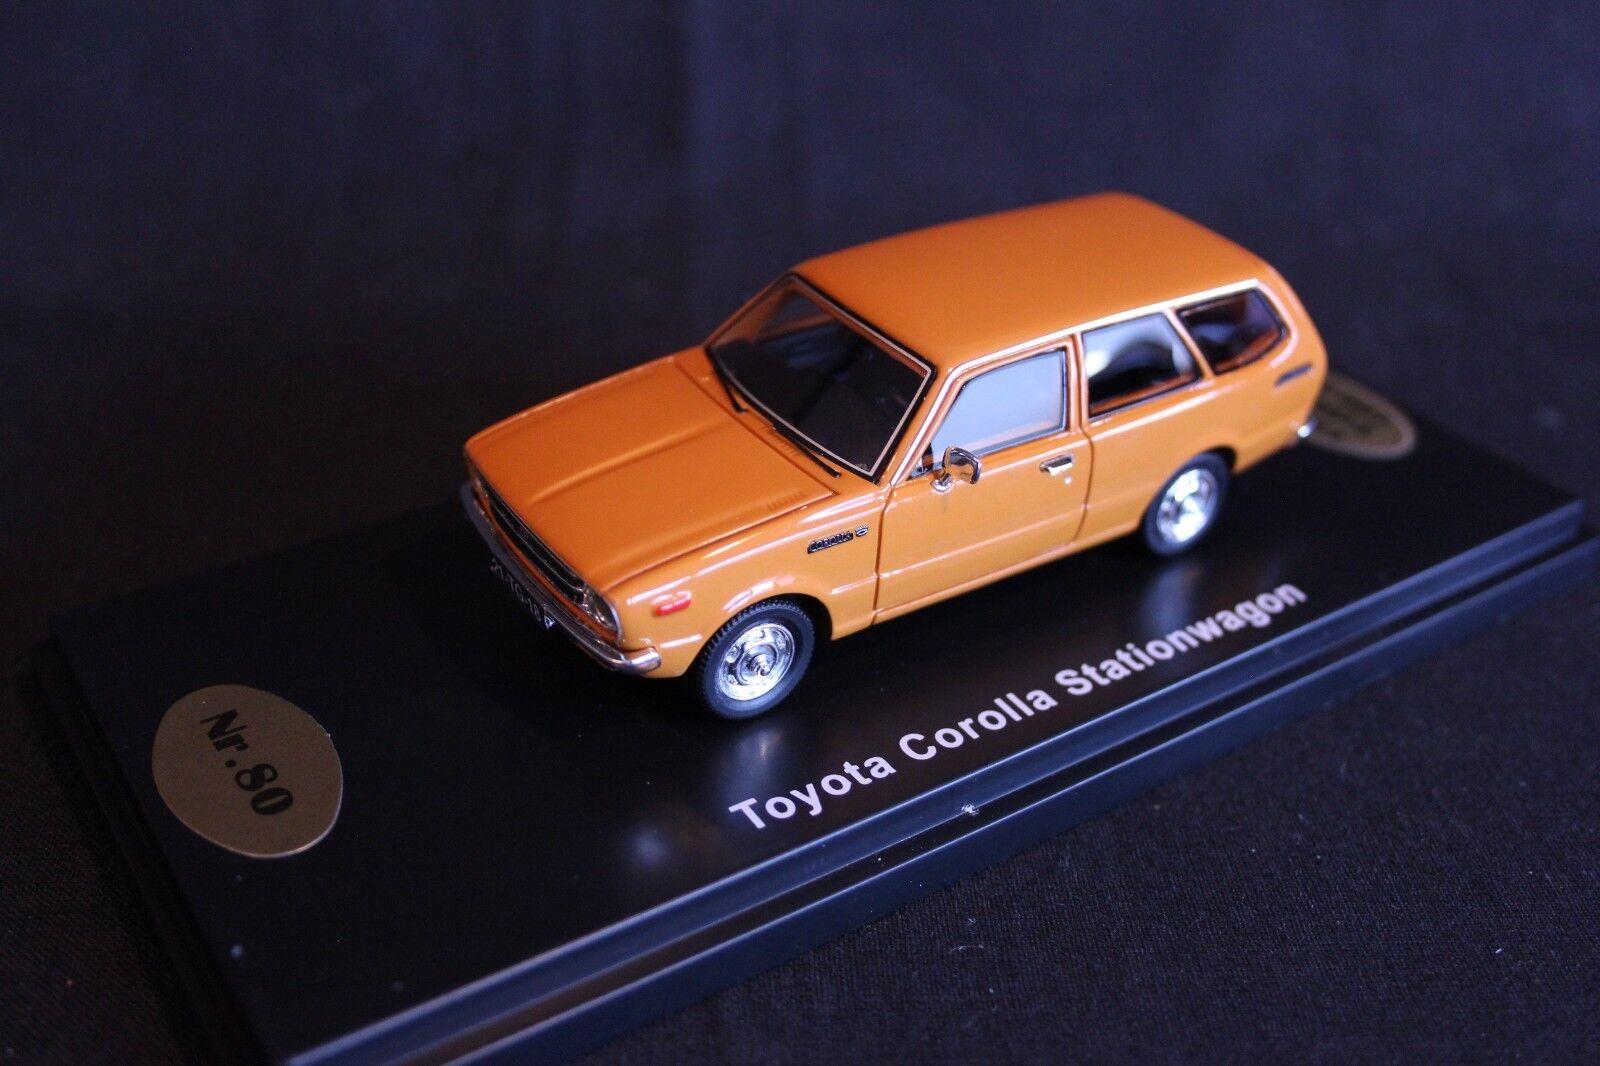 QSP Model Collection Toyota Corolla E36 Stationwagon 1 43 arancia